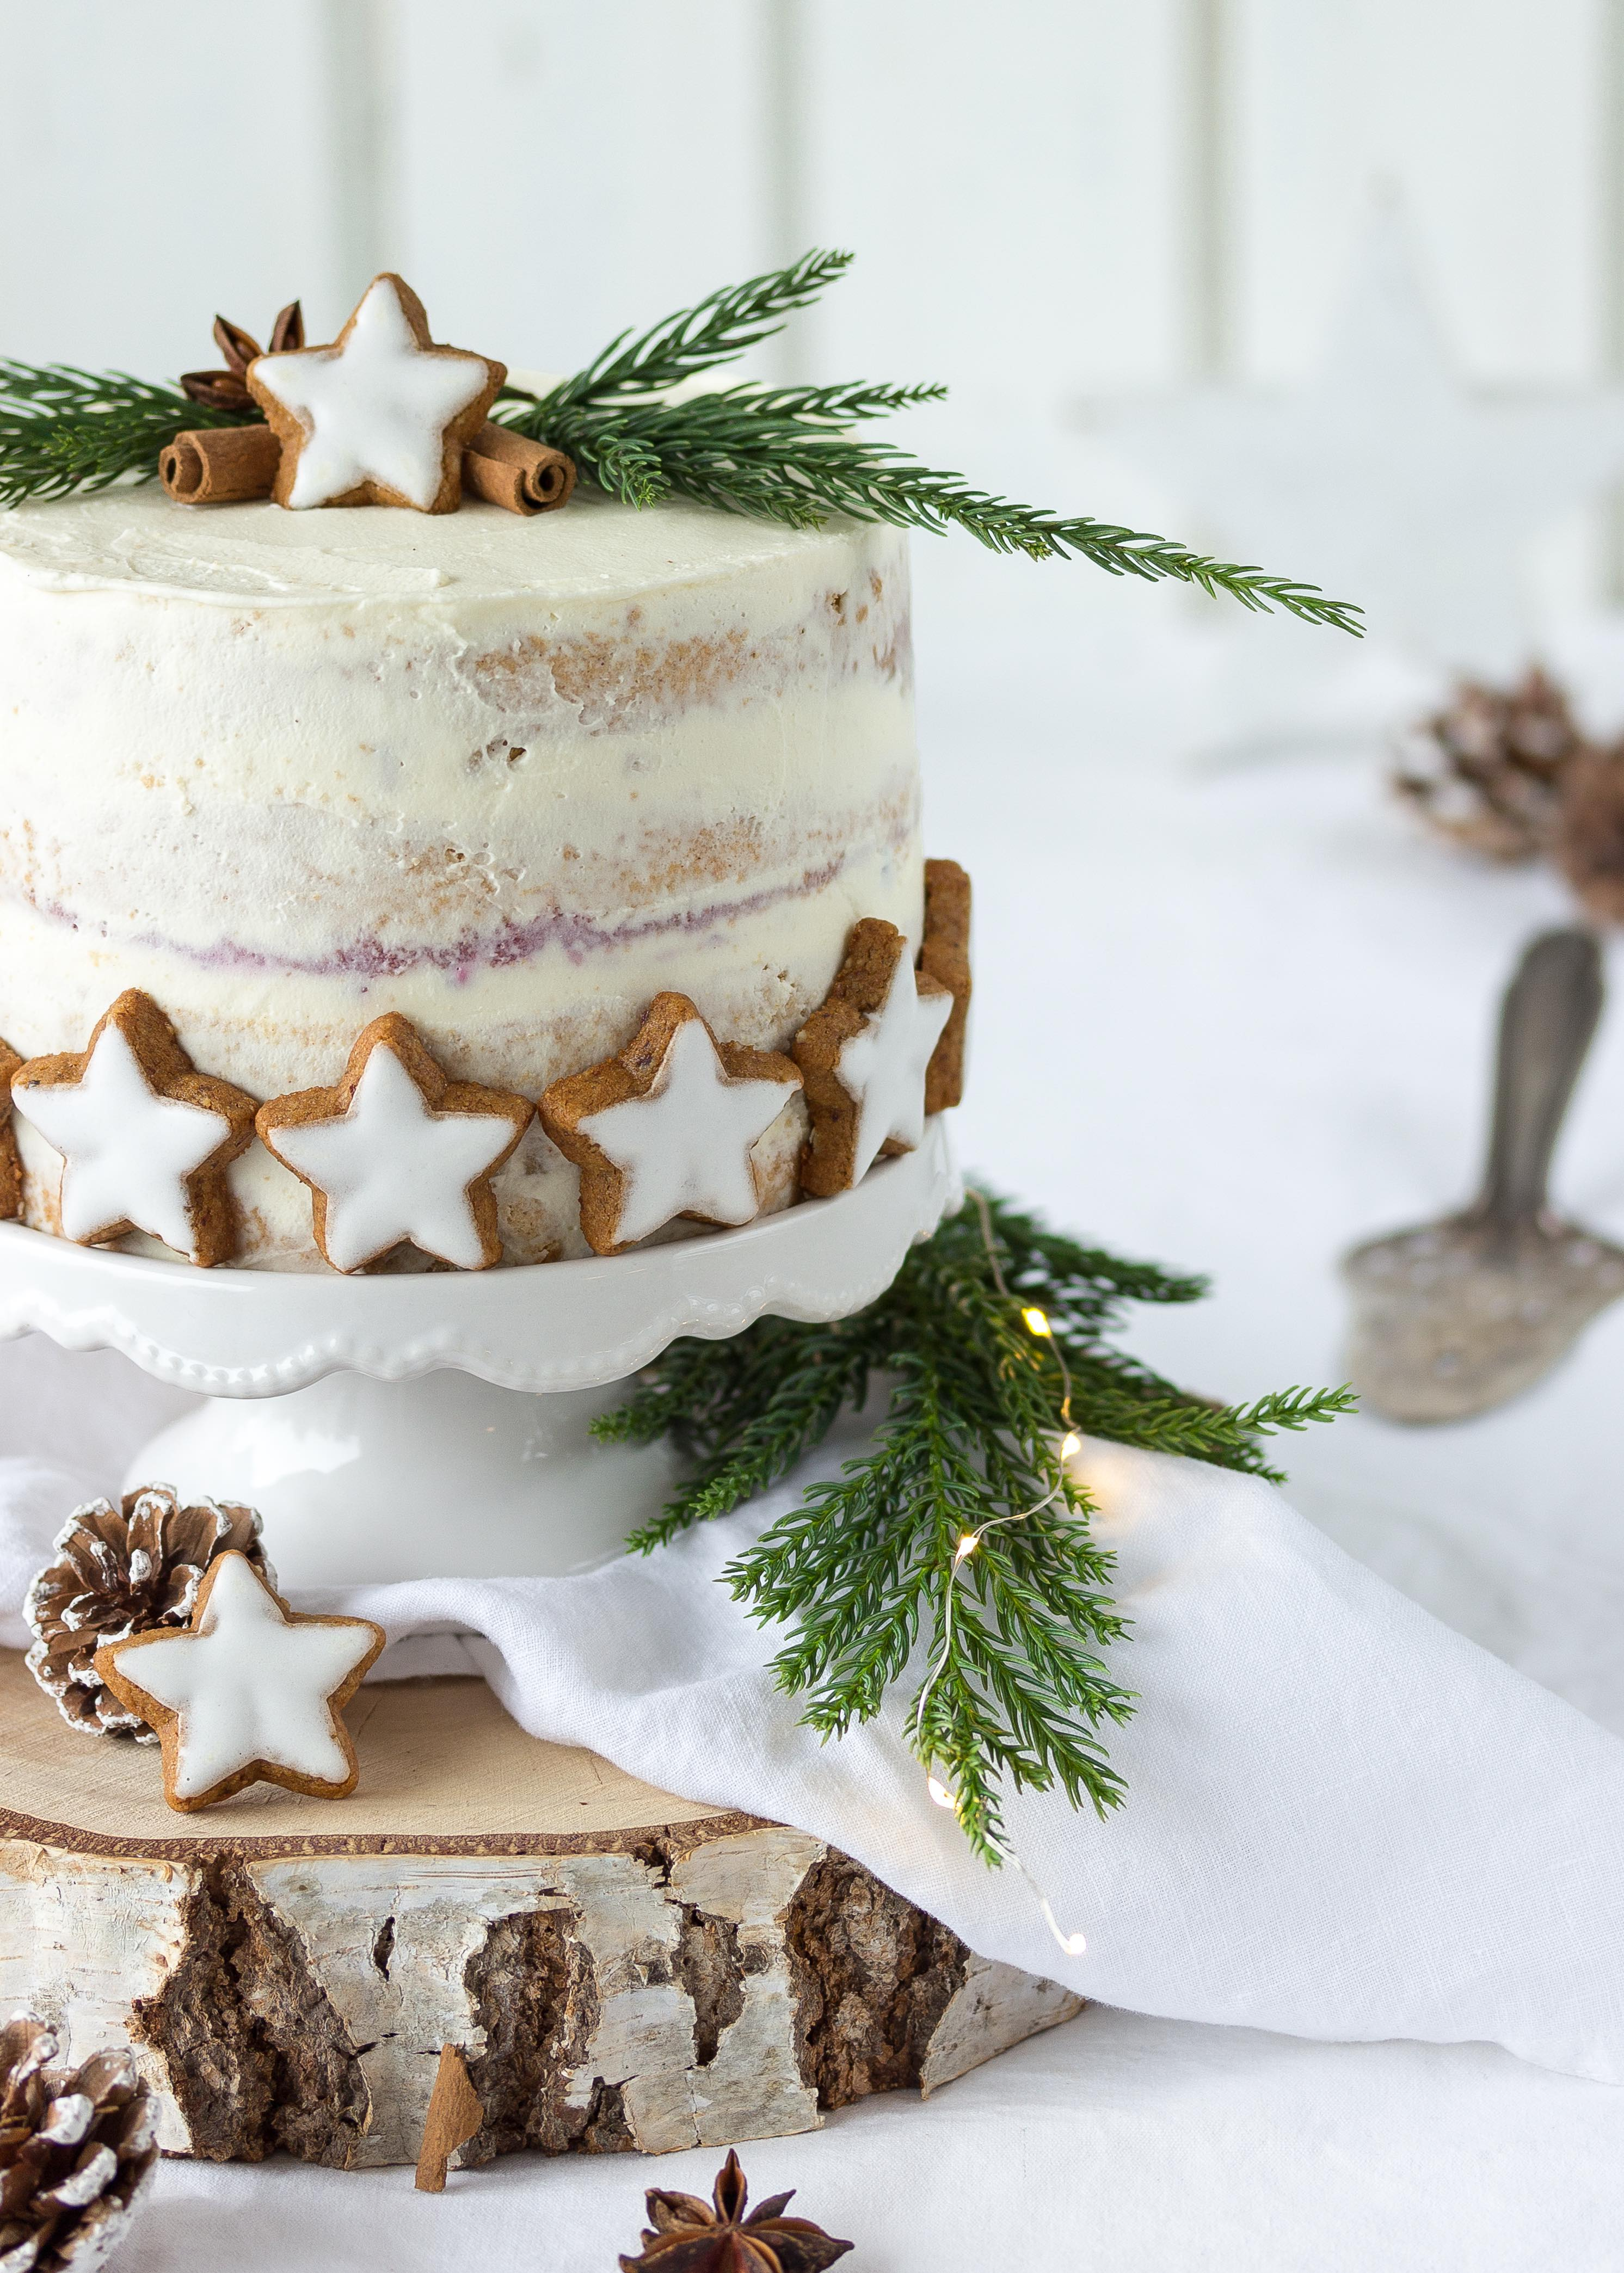 Rezept Zimtstern Apfel Preiselbeer Torte Weihnachten Advent Backen